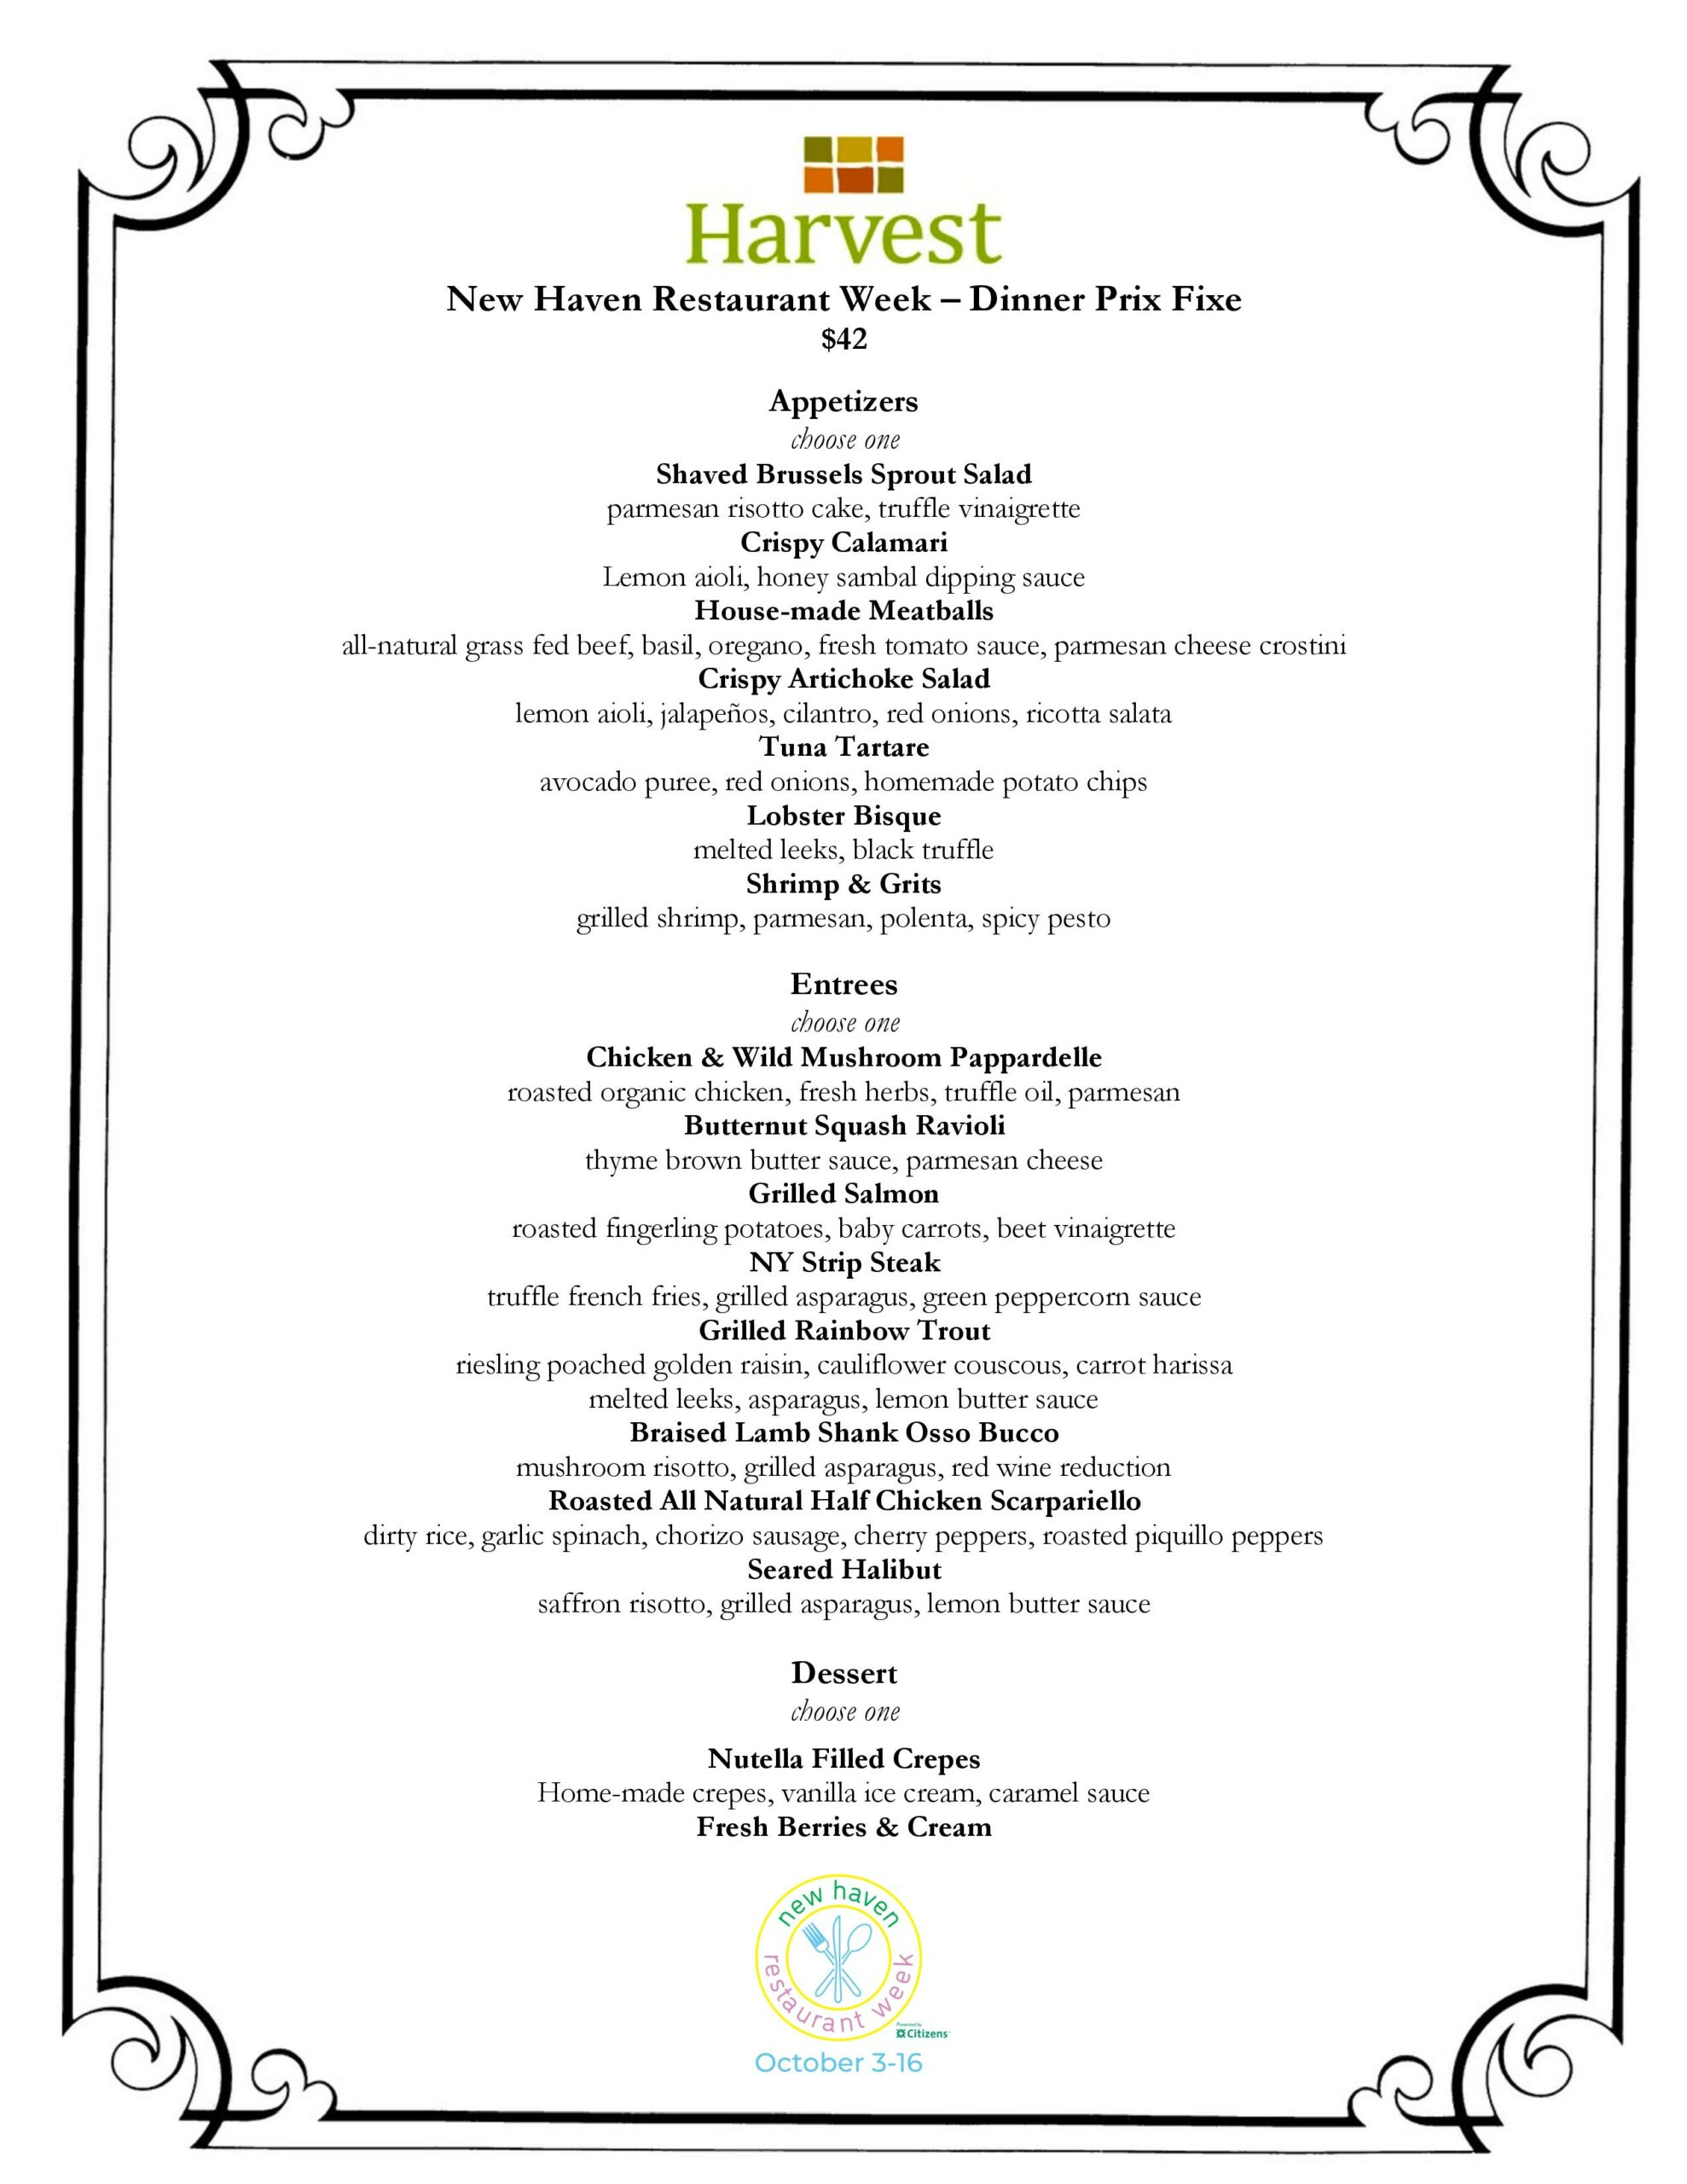 Harvest New Haven Restaurant Week